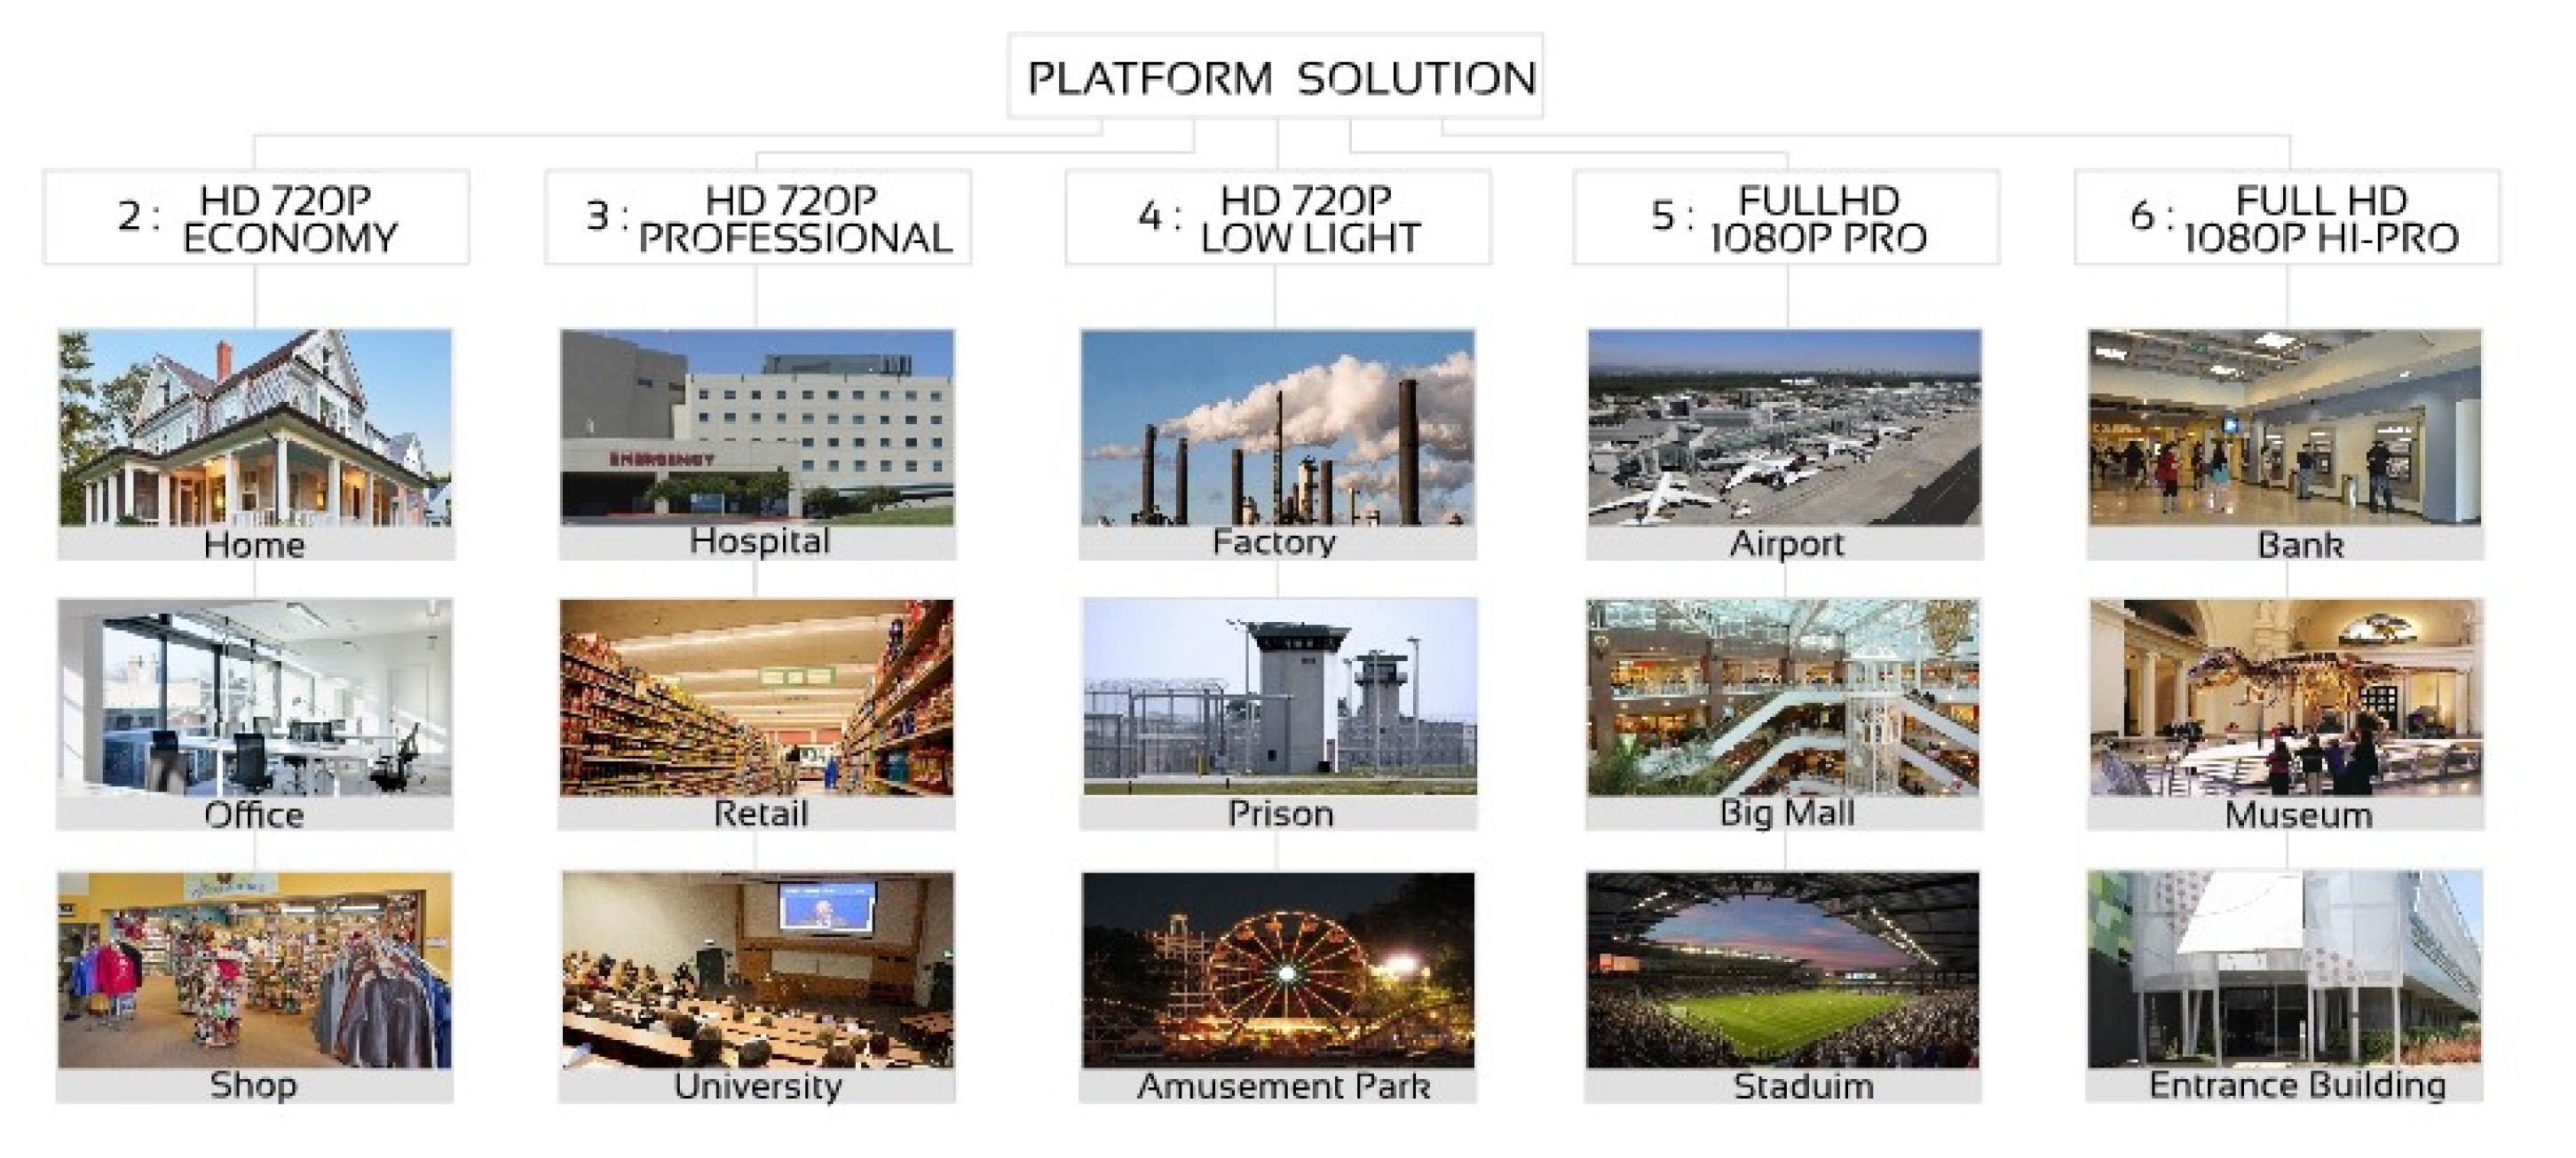 PLATFORM SOLUTION HD-TVI